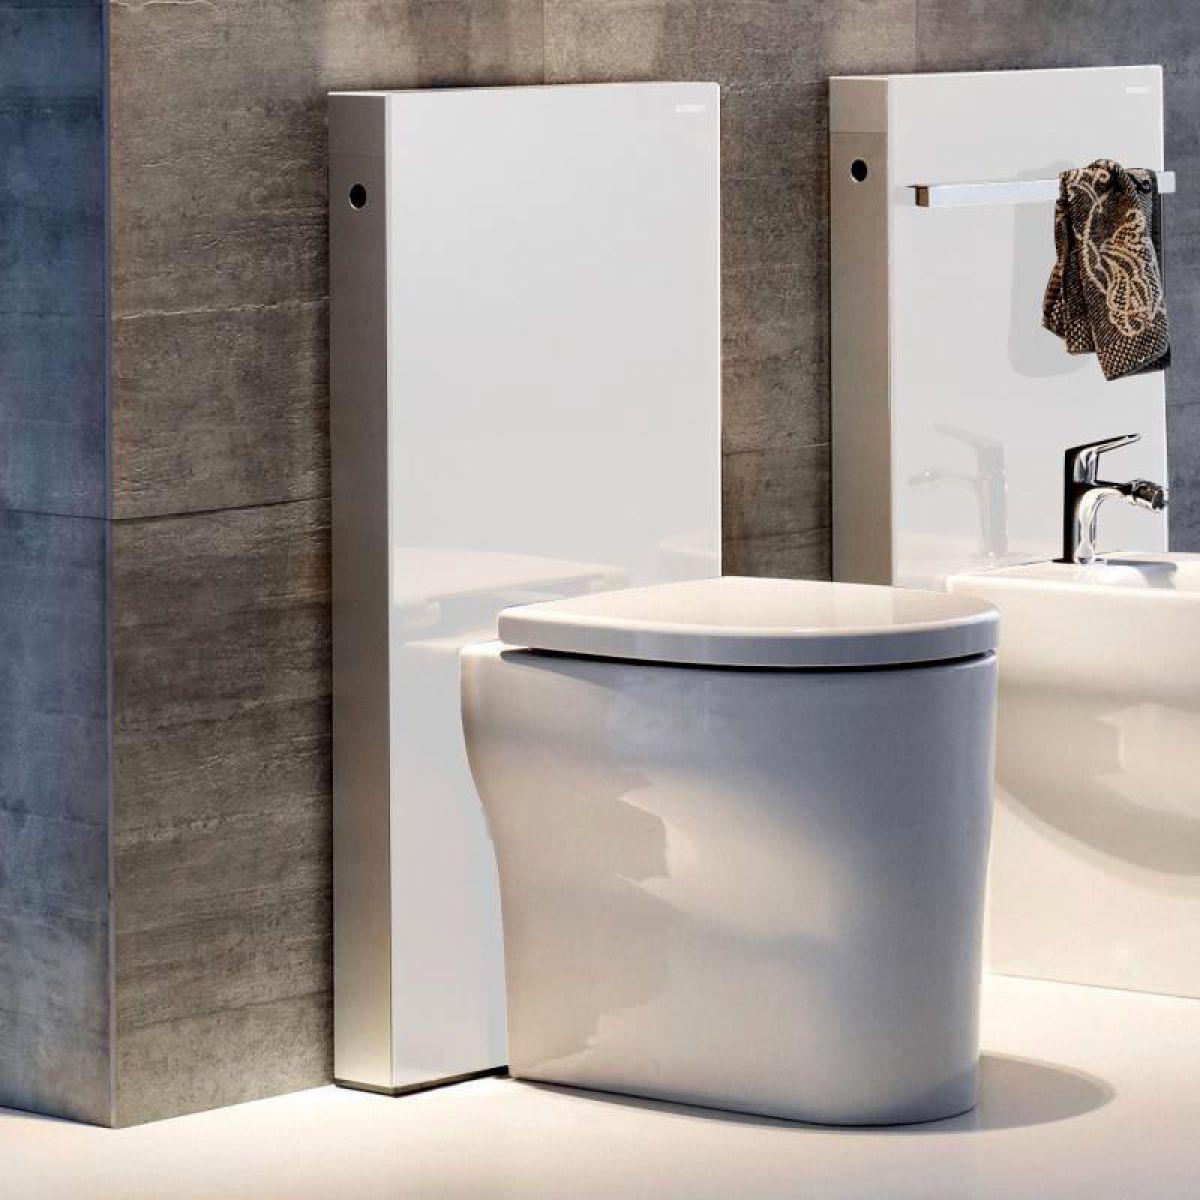 geberit monolith for floor standing toilets uk bathrooms. Black Bedroom Furniture Sets. Home Design Ideas